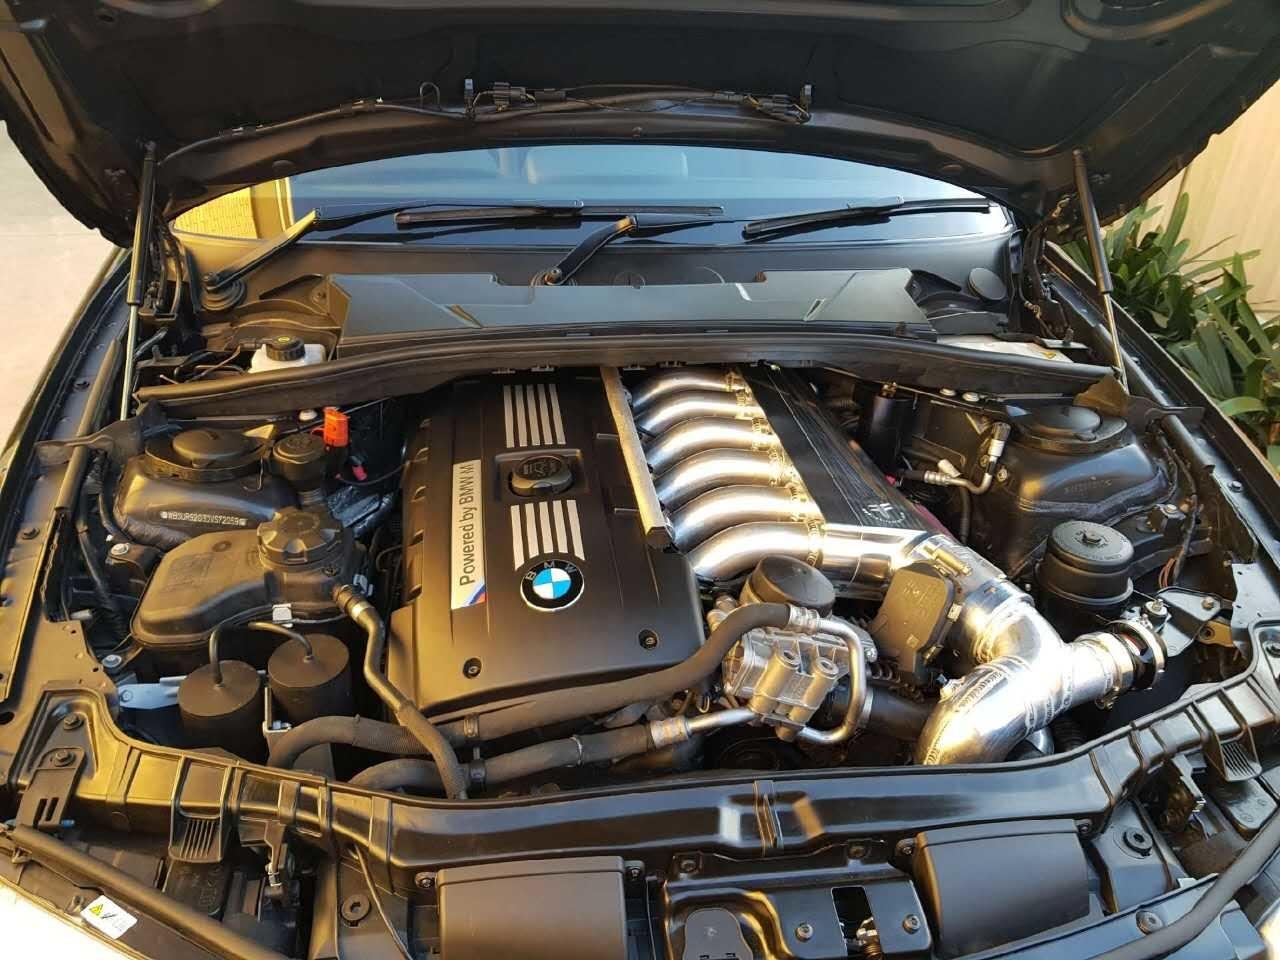 BMW manifold